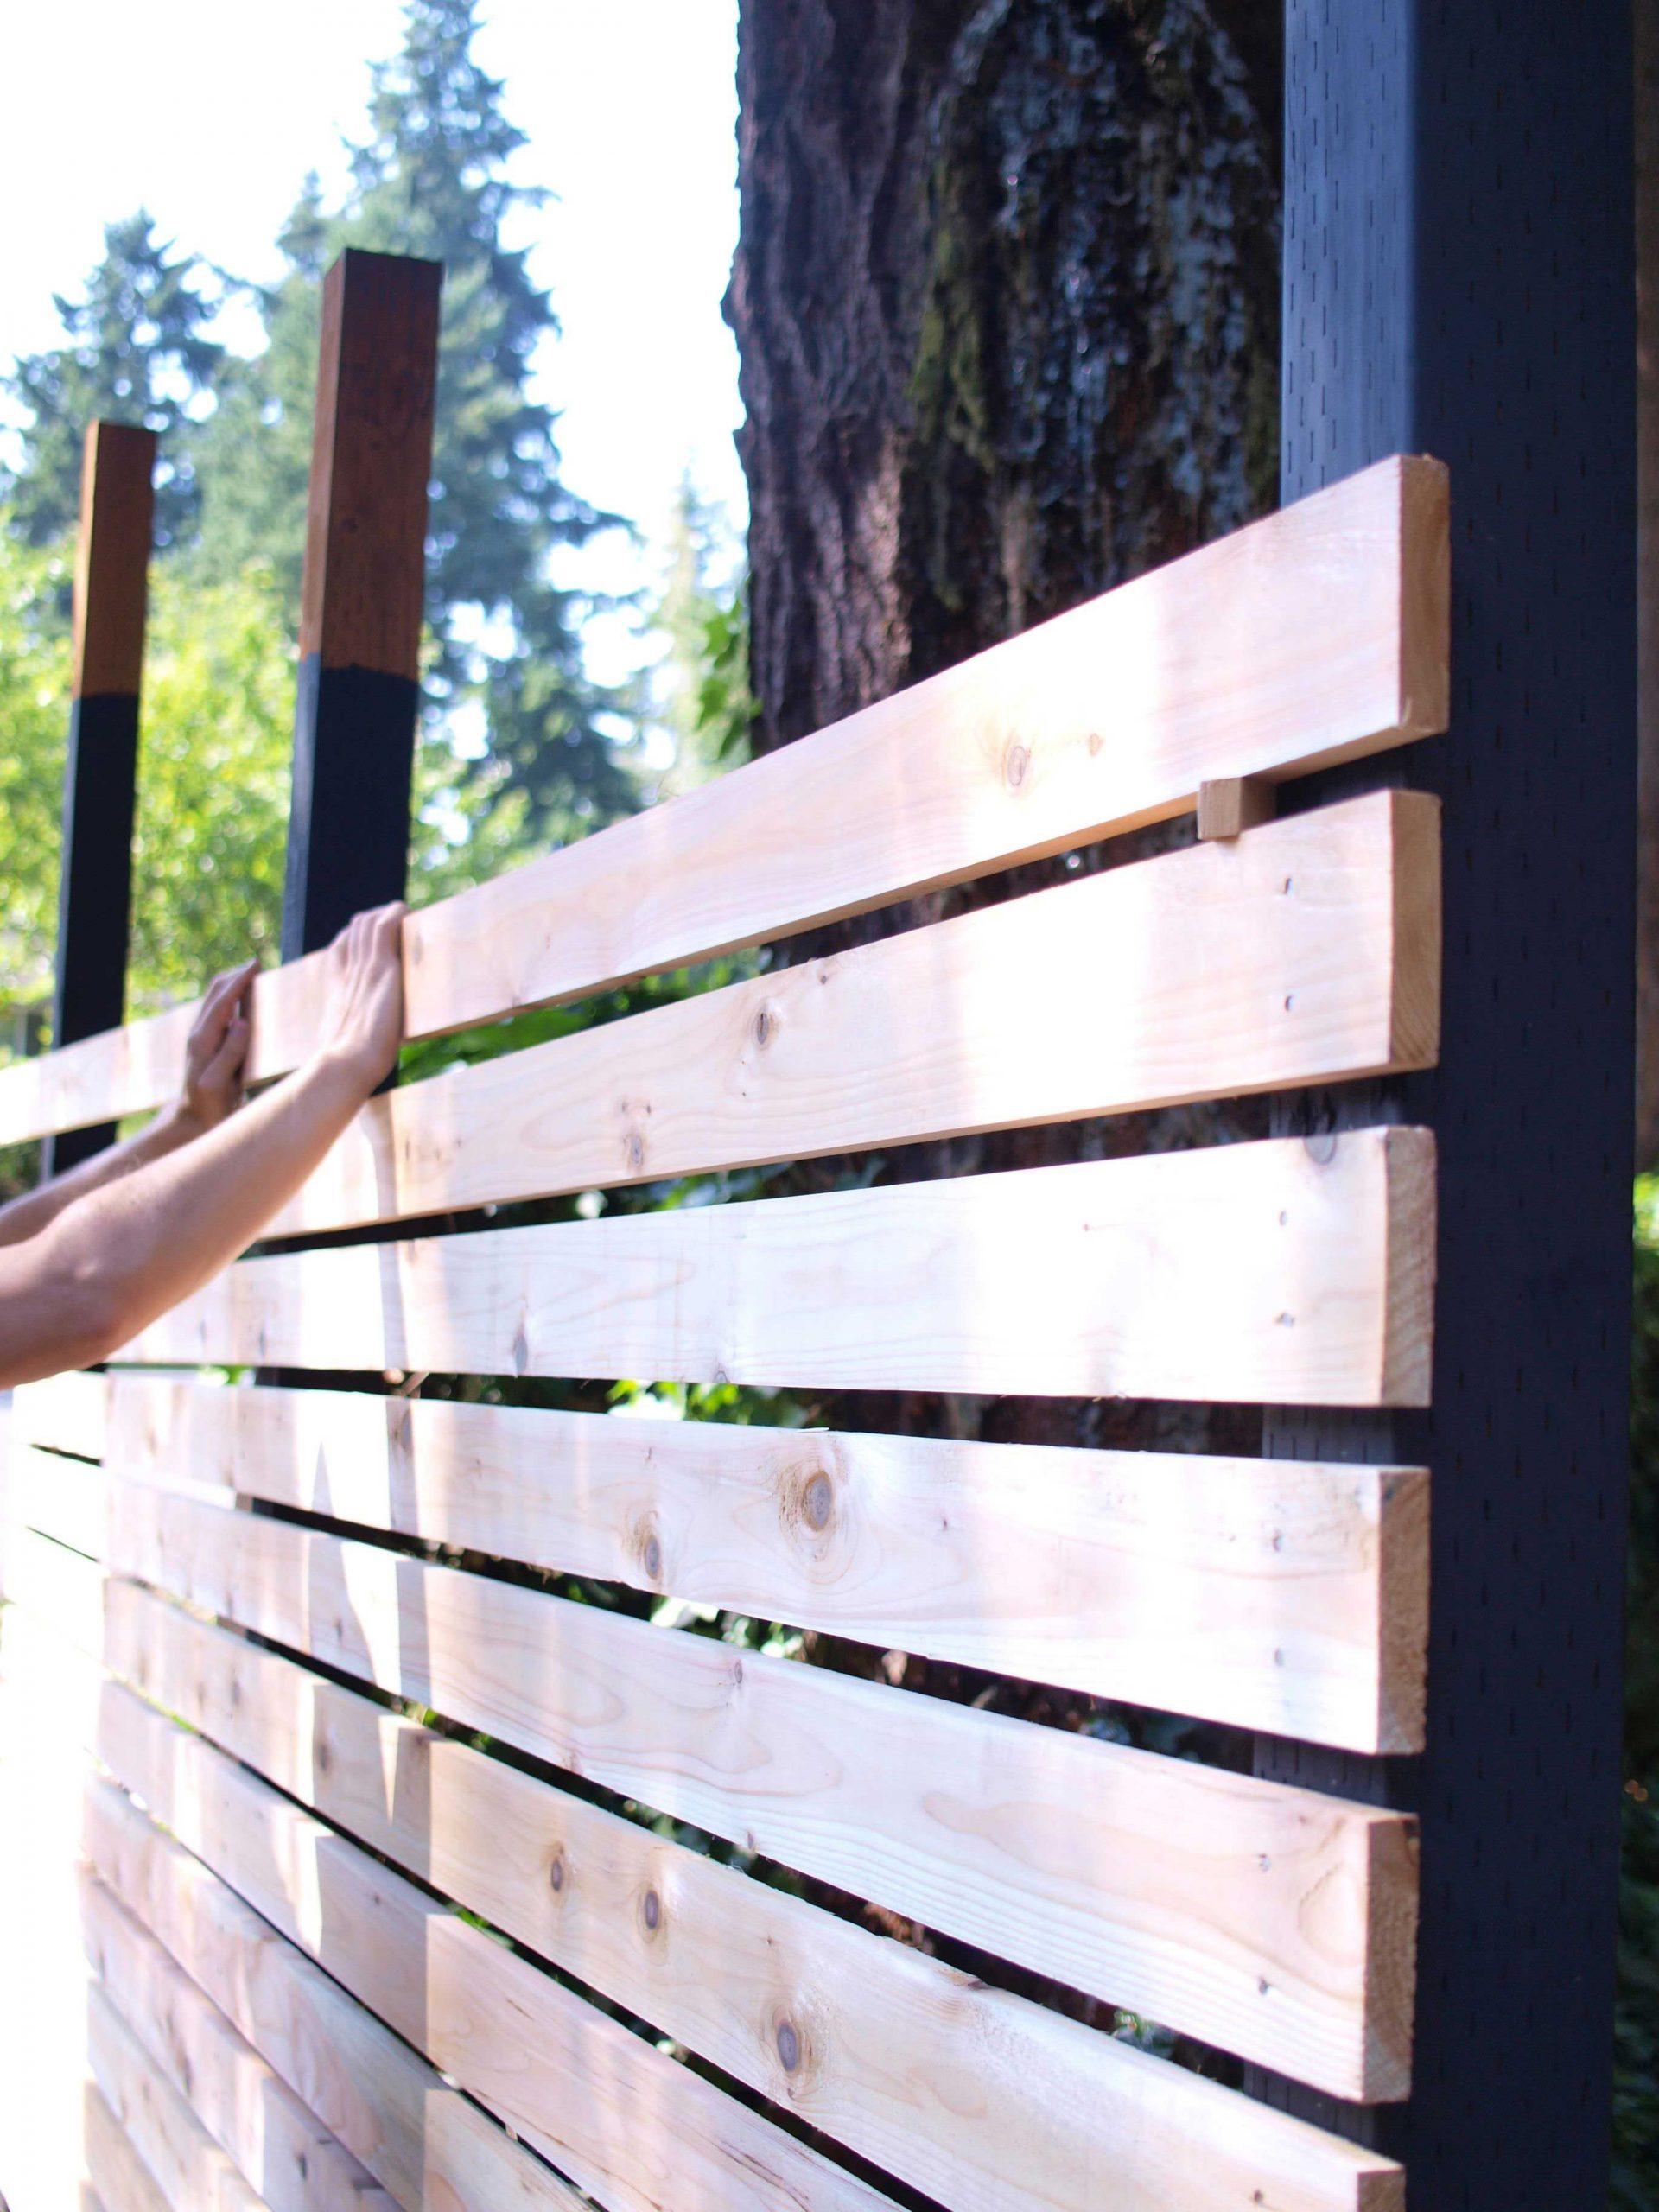 How To Build A Diy Backyard Fence, Part Ii | Cloture Jardin ... tout Panneau Separation Jardin